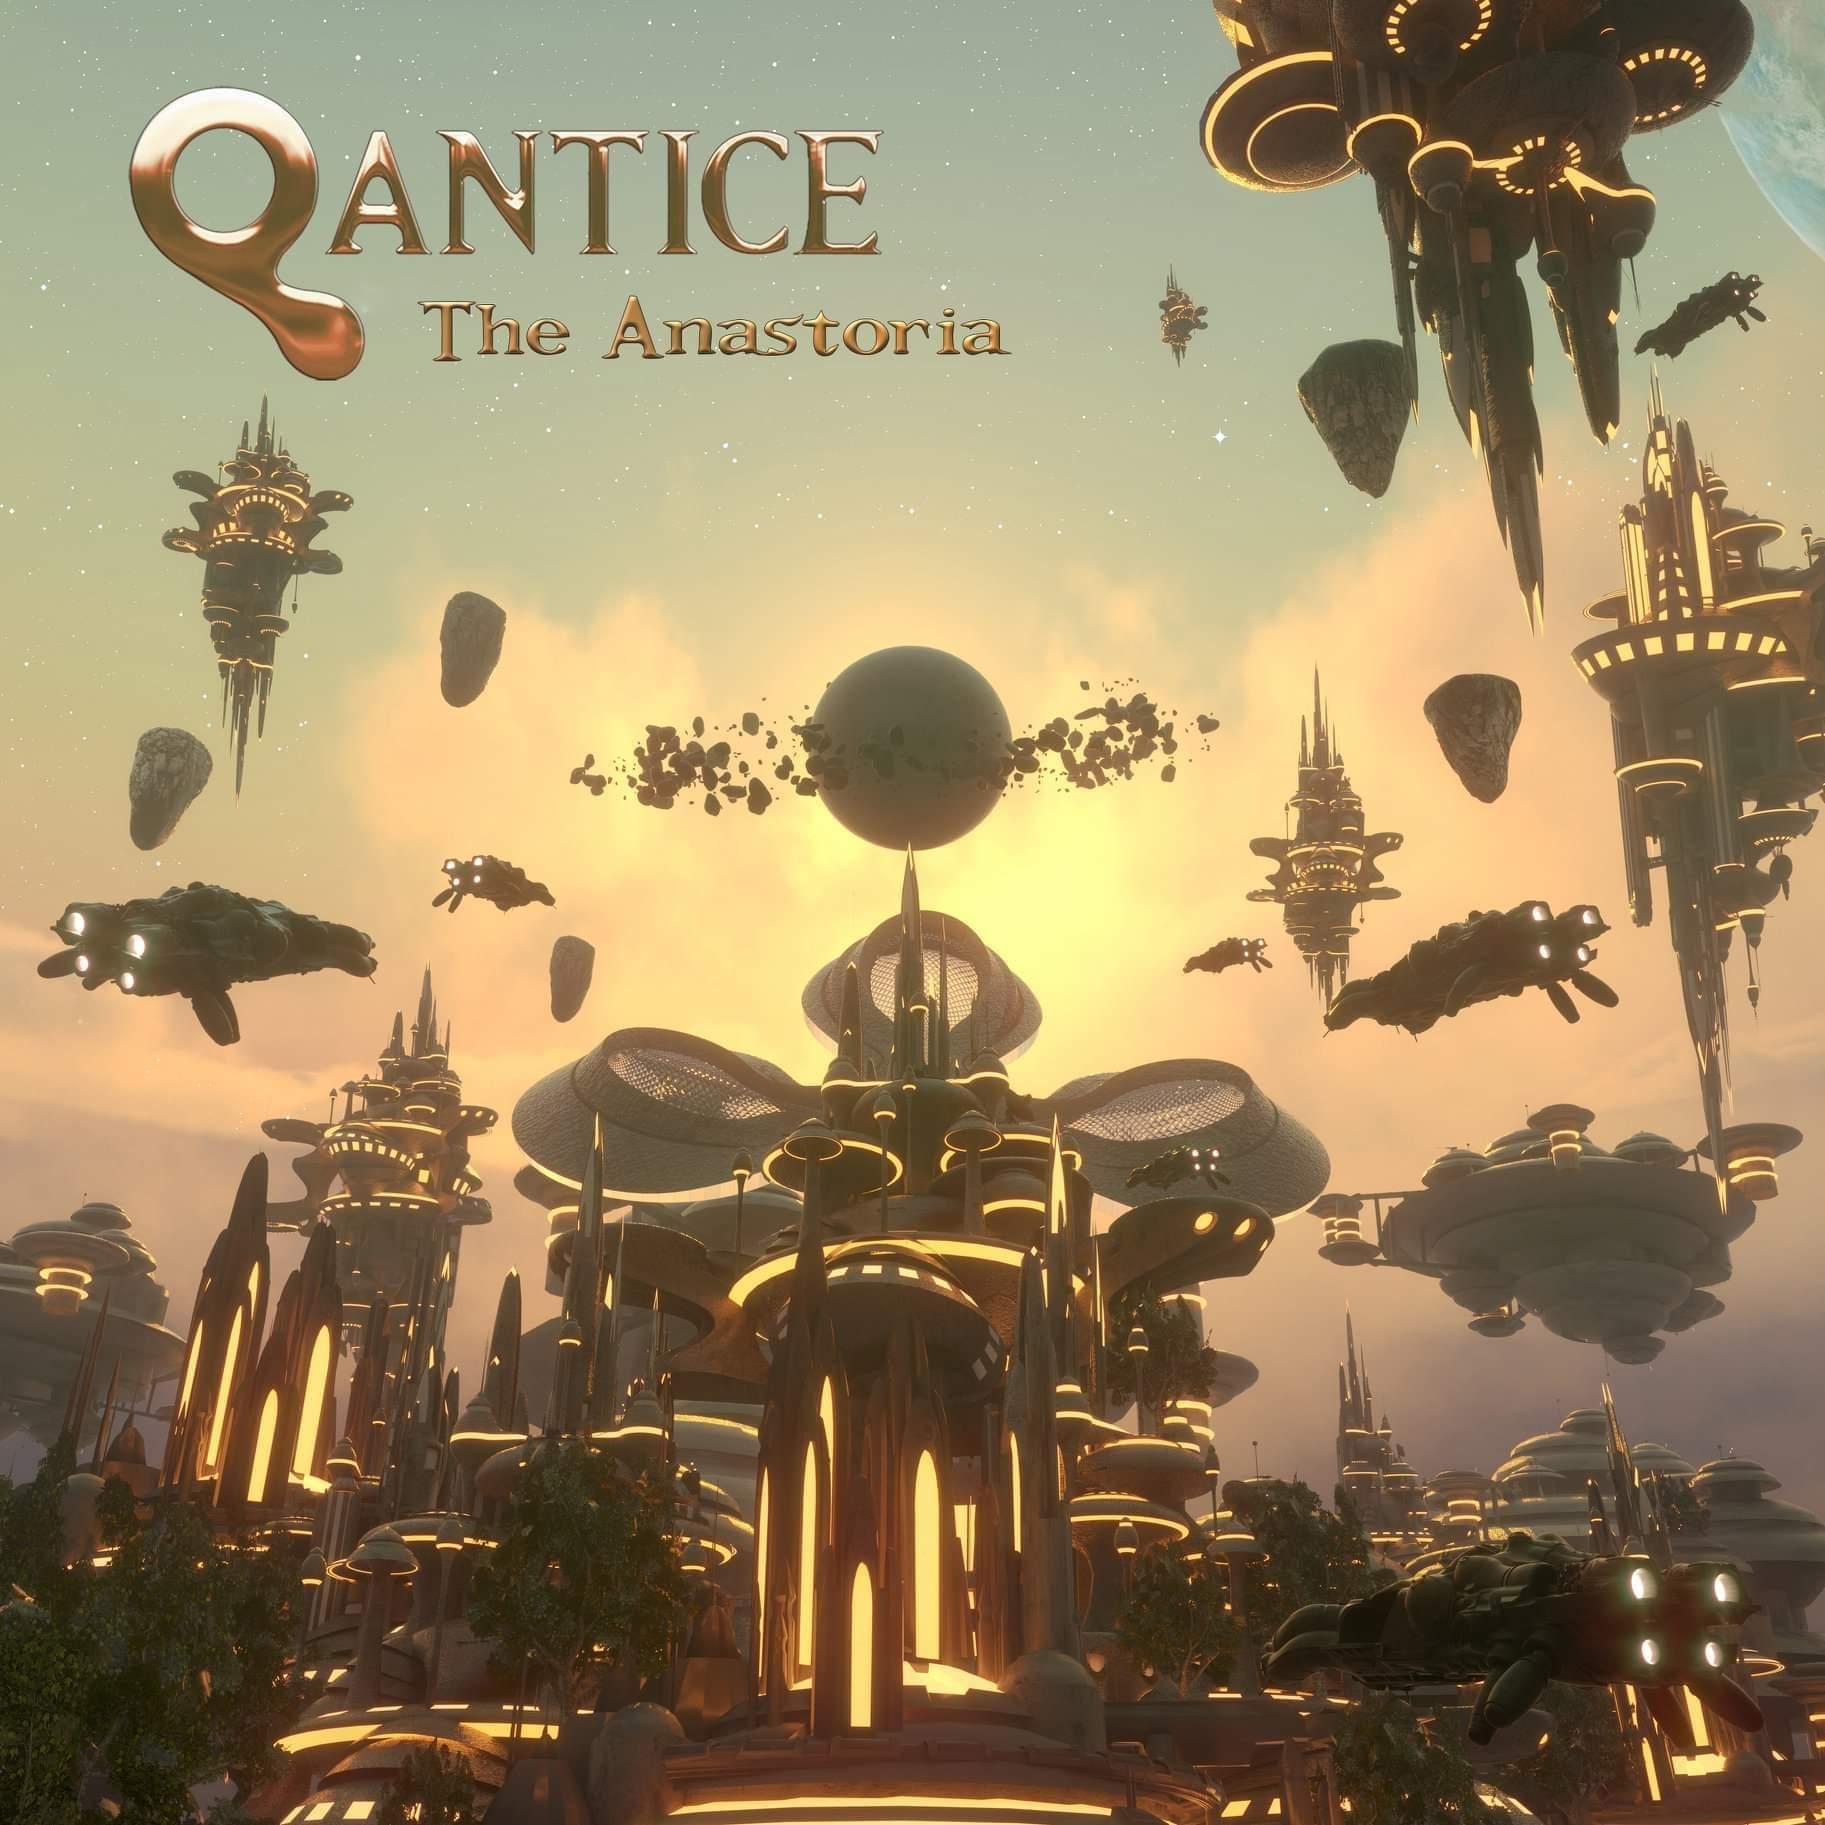 Qantice: The Anastoria